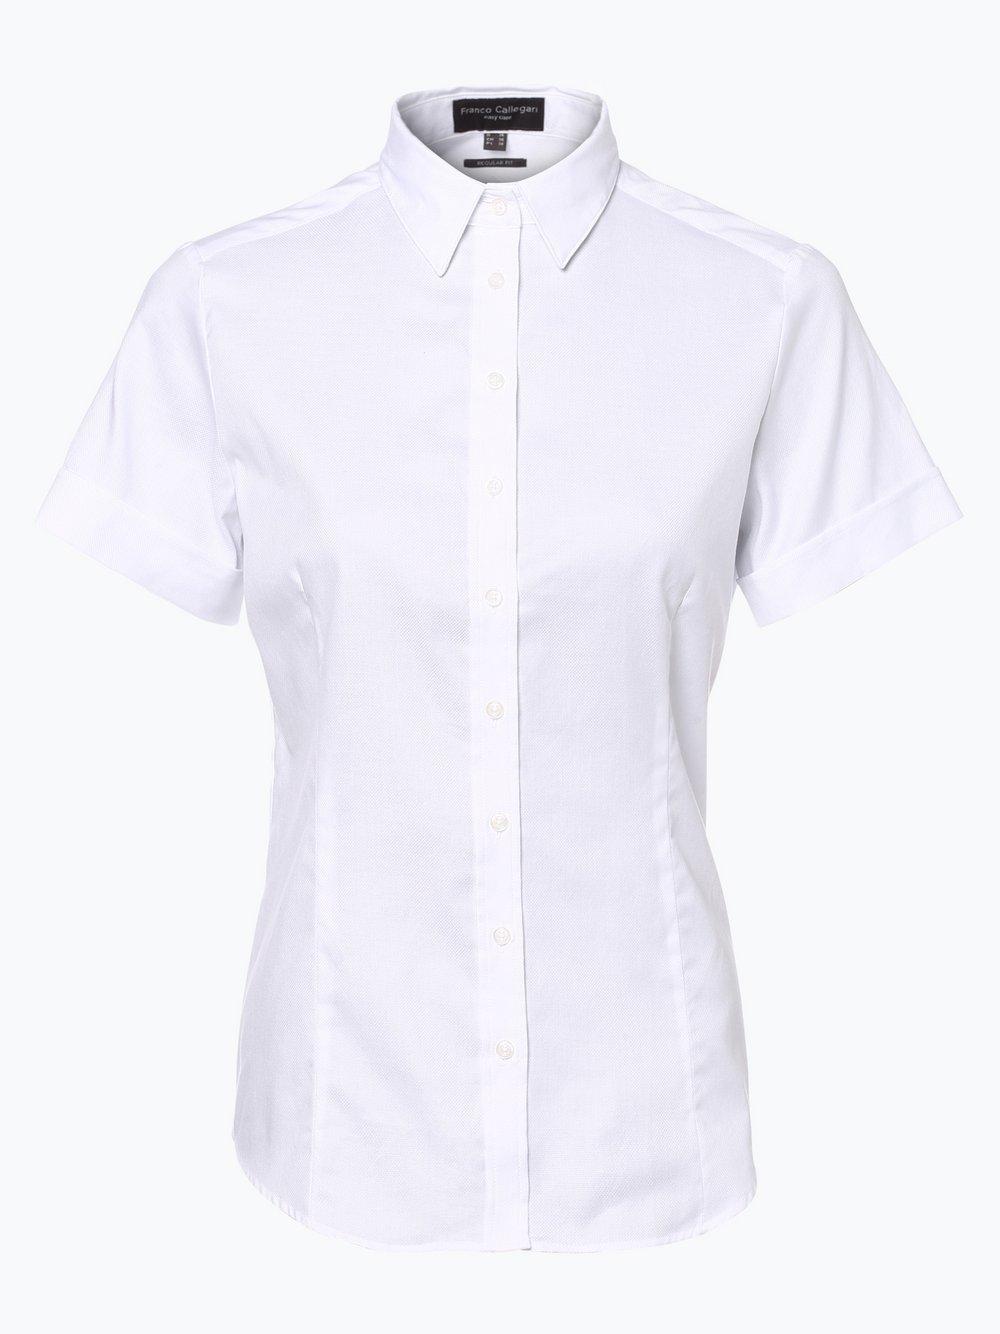 Franco Callegari – Bluzka damska, biały Van Graaf 311229-0006